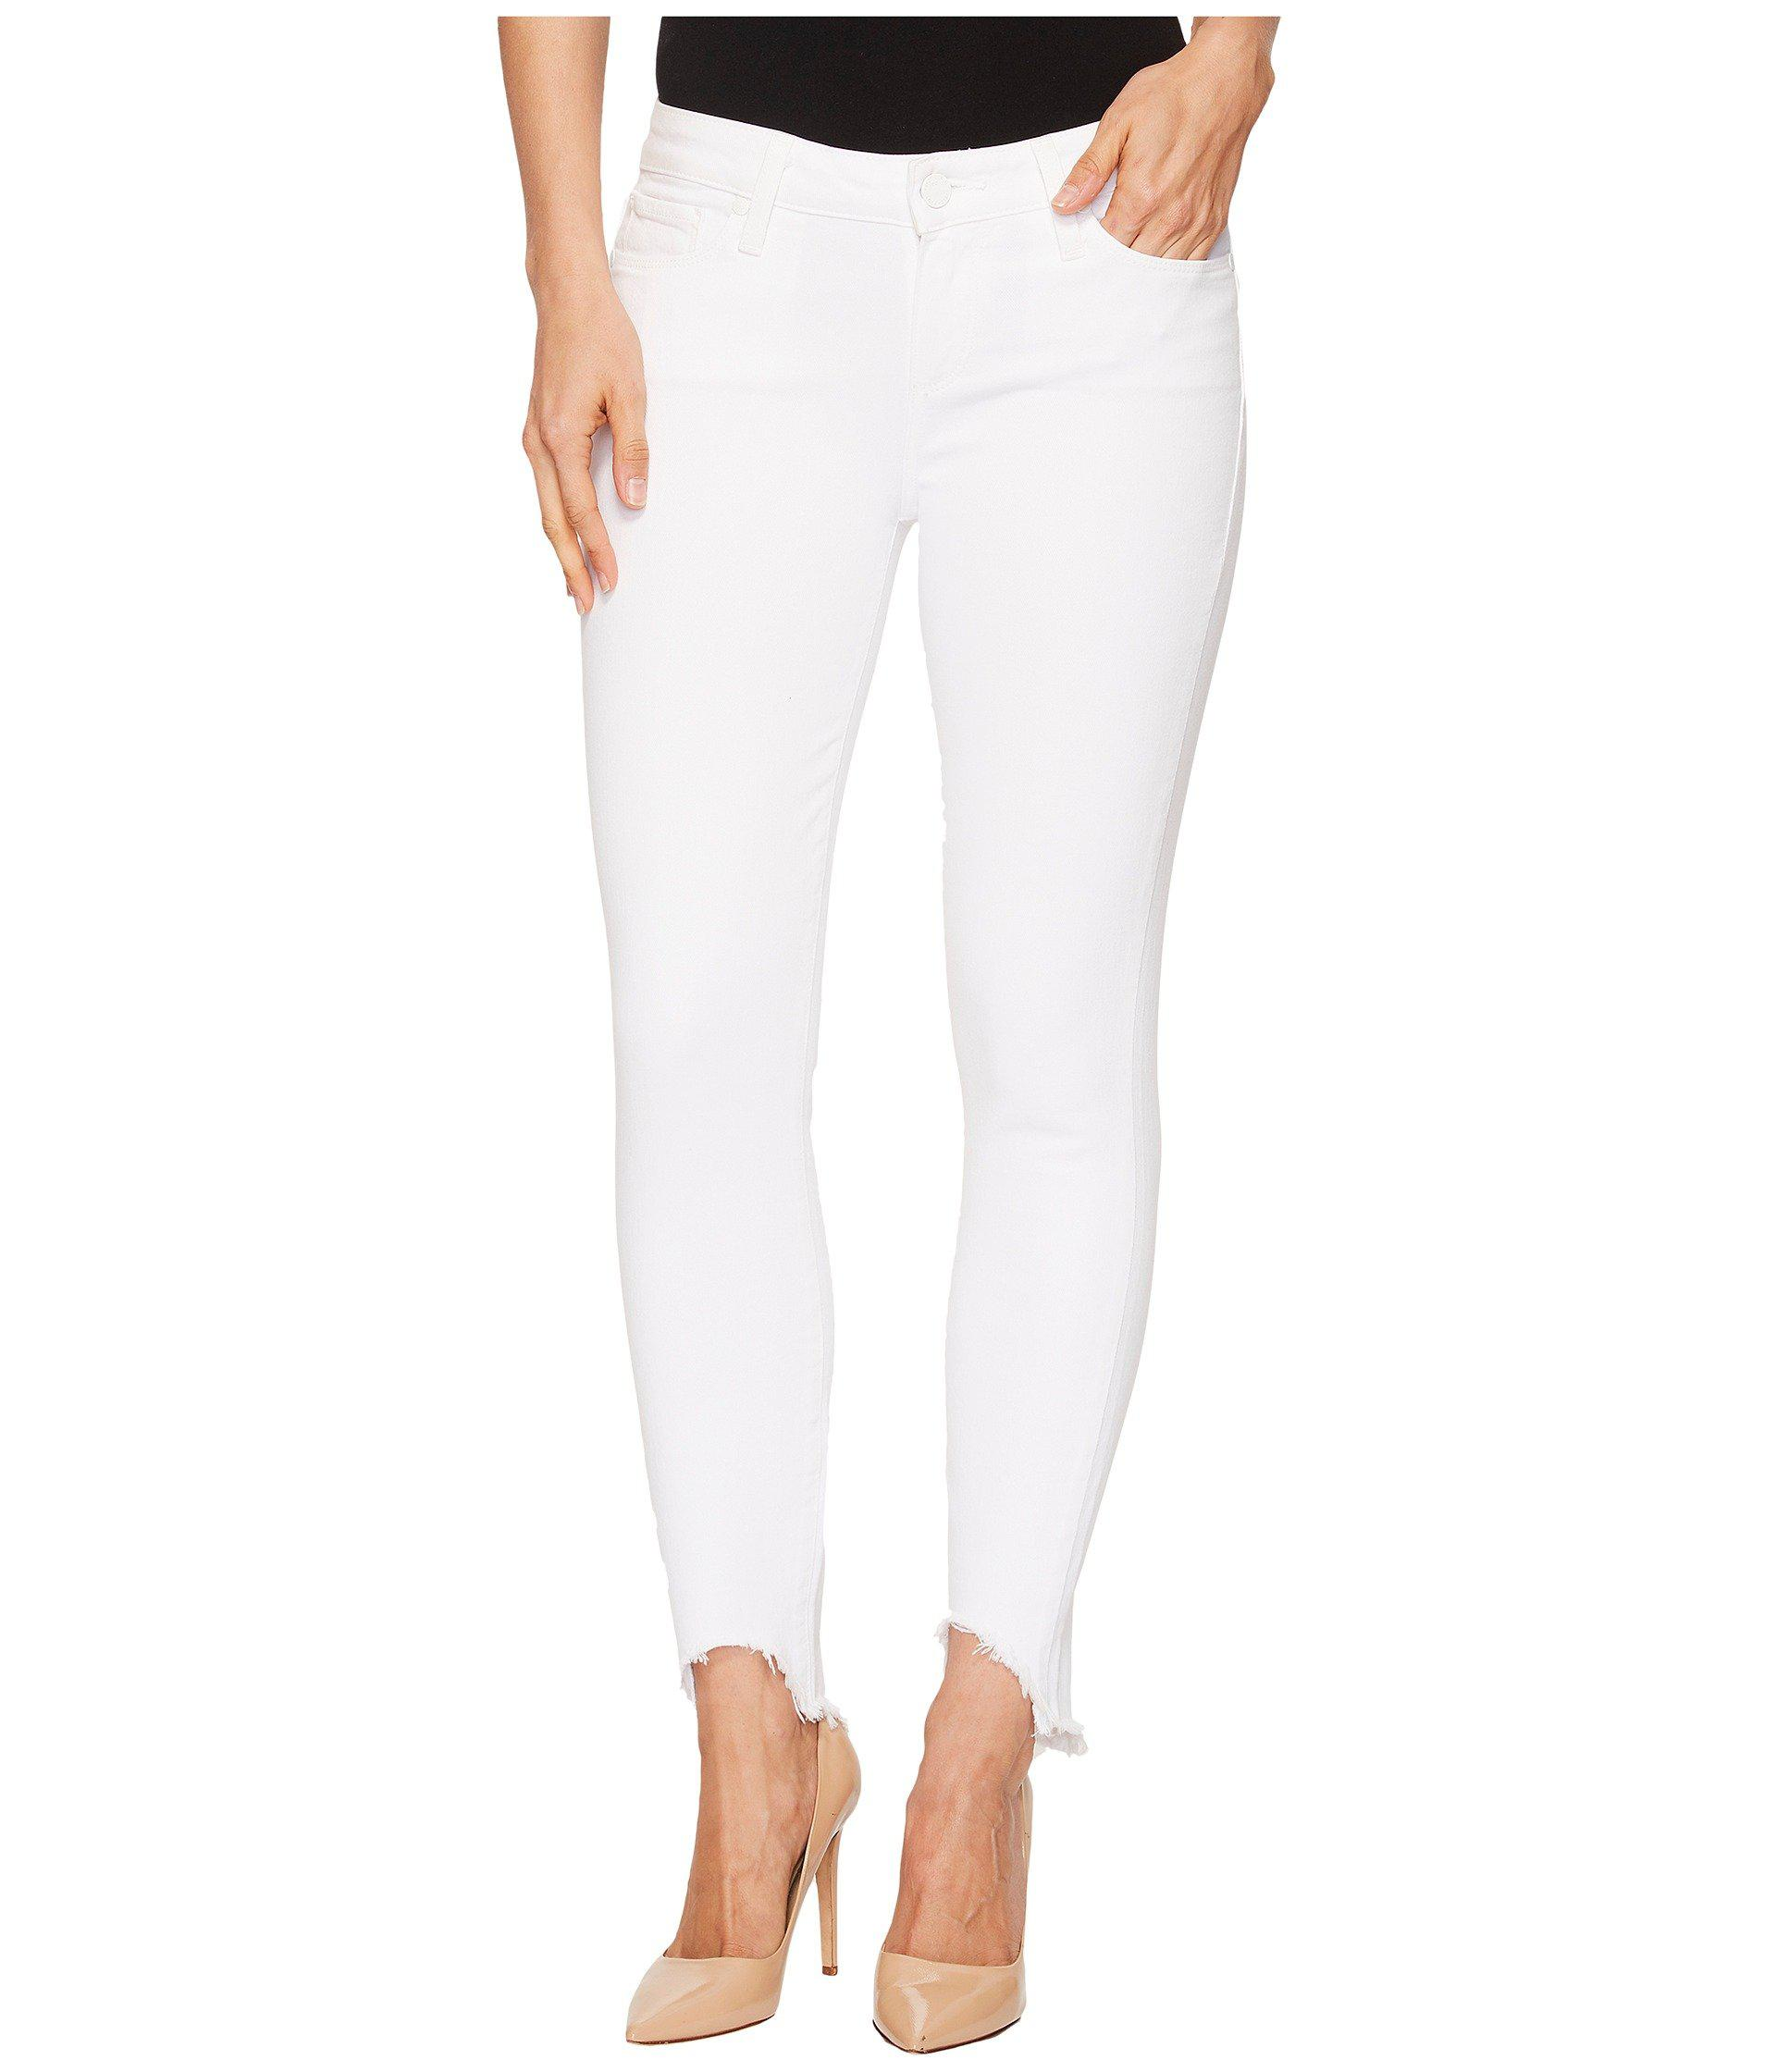 9717d5d5d97 PAIGE Verdugo Crop W/ Arched Hem In Crisp White in White - Lyst